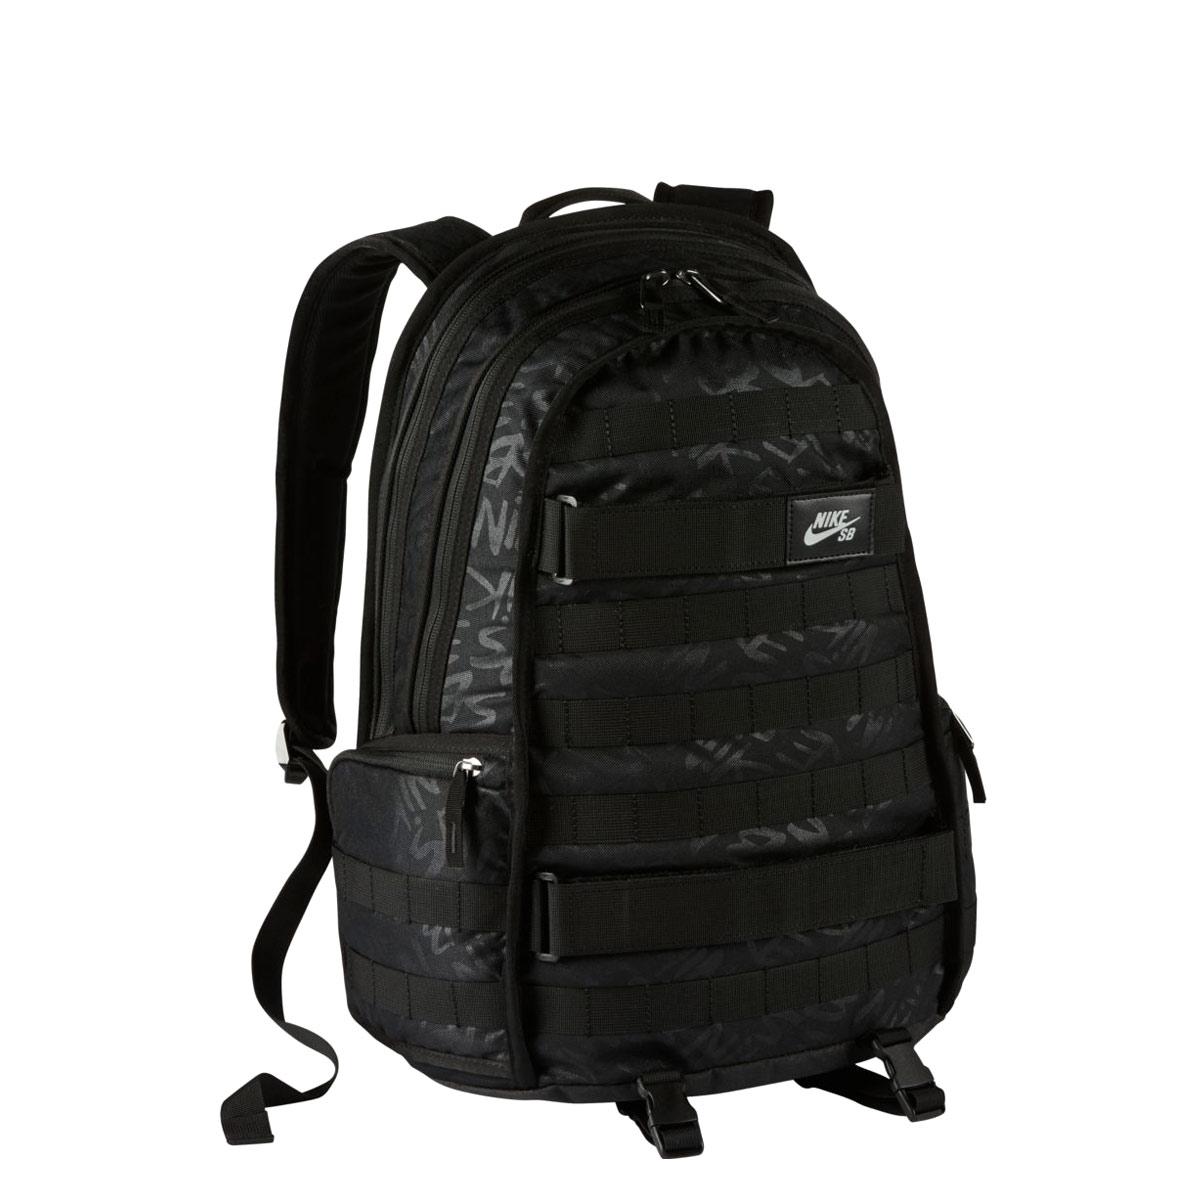 179ace4bfebd NIKE NK SB RPM BKPK - AOP (Nike SB PRM graphic backpack) BLACK BLACK BLACK  17FA-I